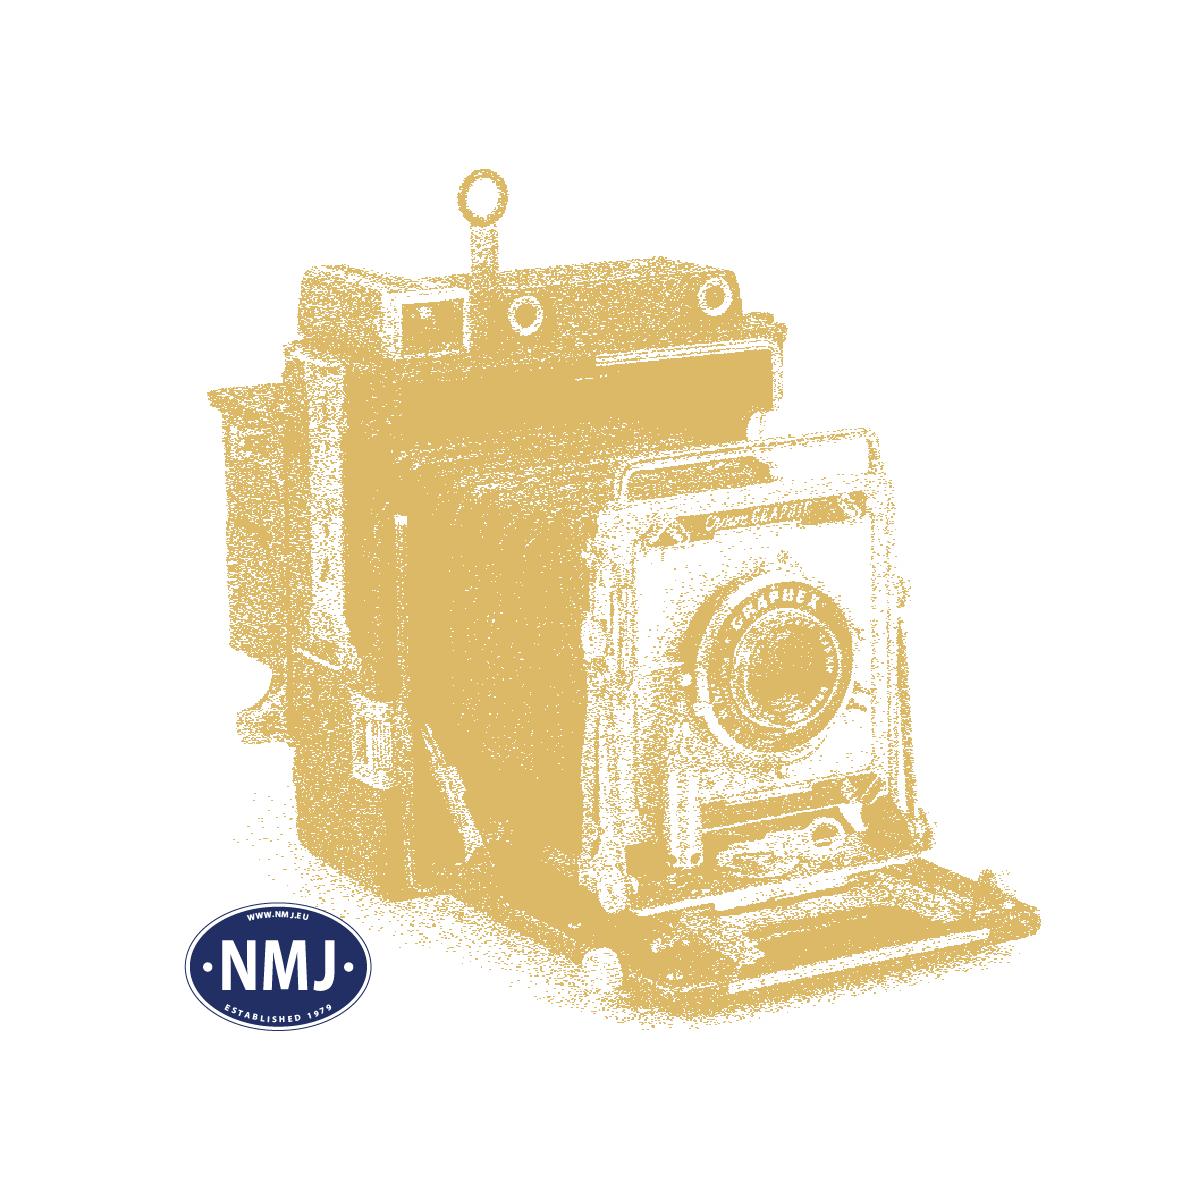 Topline Lokomotiver, nmj-topline-93108-nsb-el14-2171-red-black-livery-V1-dc, NMJT93108